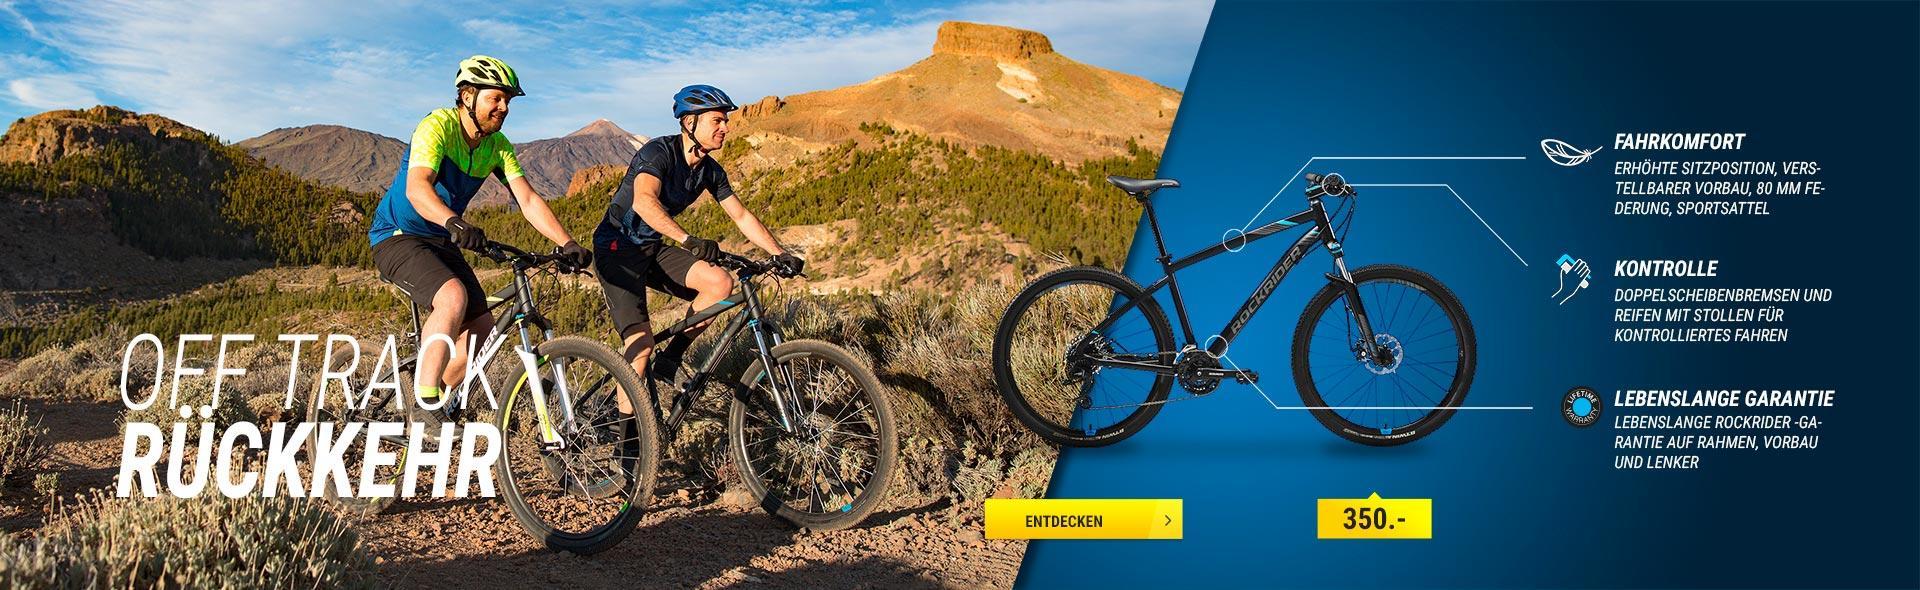 Mountainbike Fahrräder